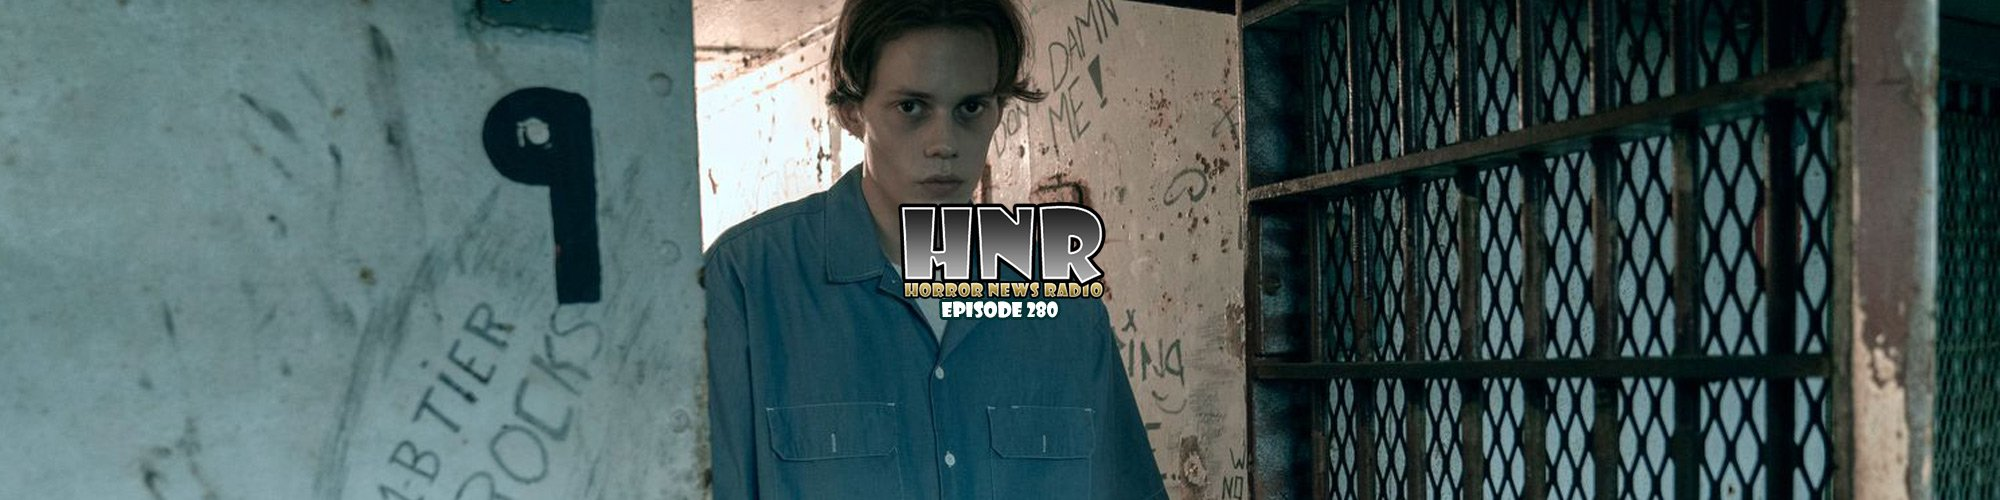 Castle Rock S01E03 and S01E04 — Episode 280 — Horror News